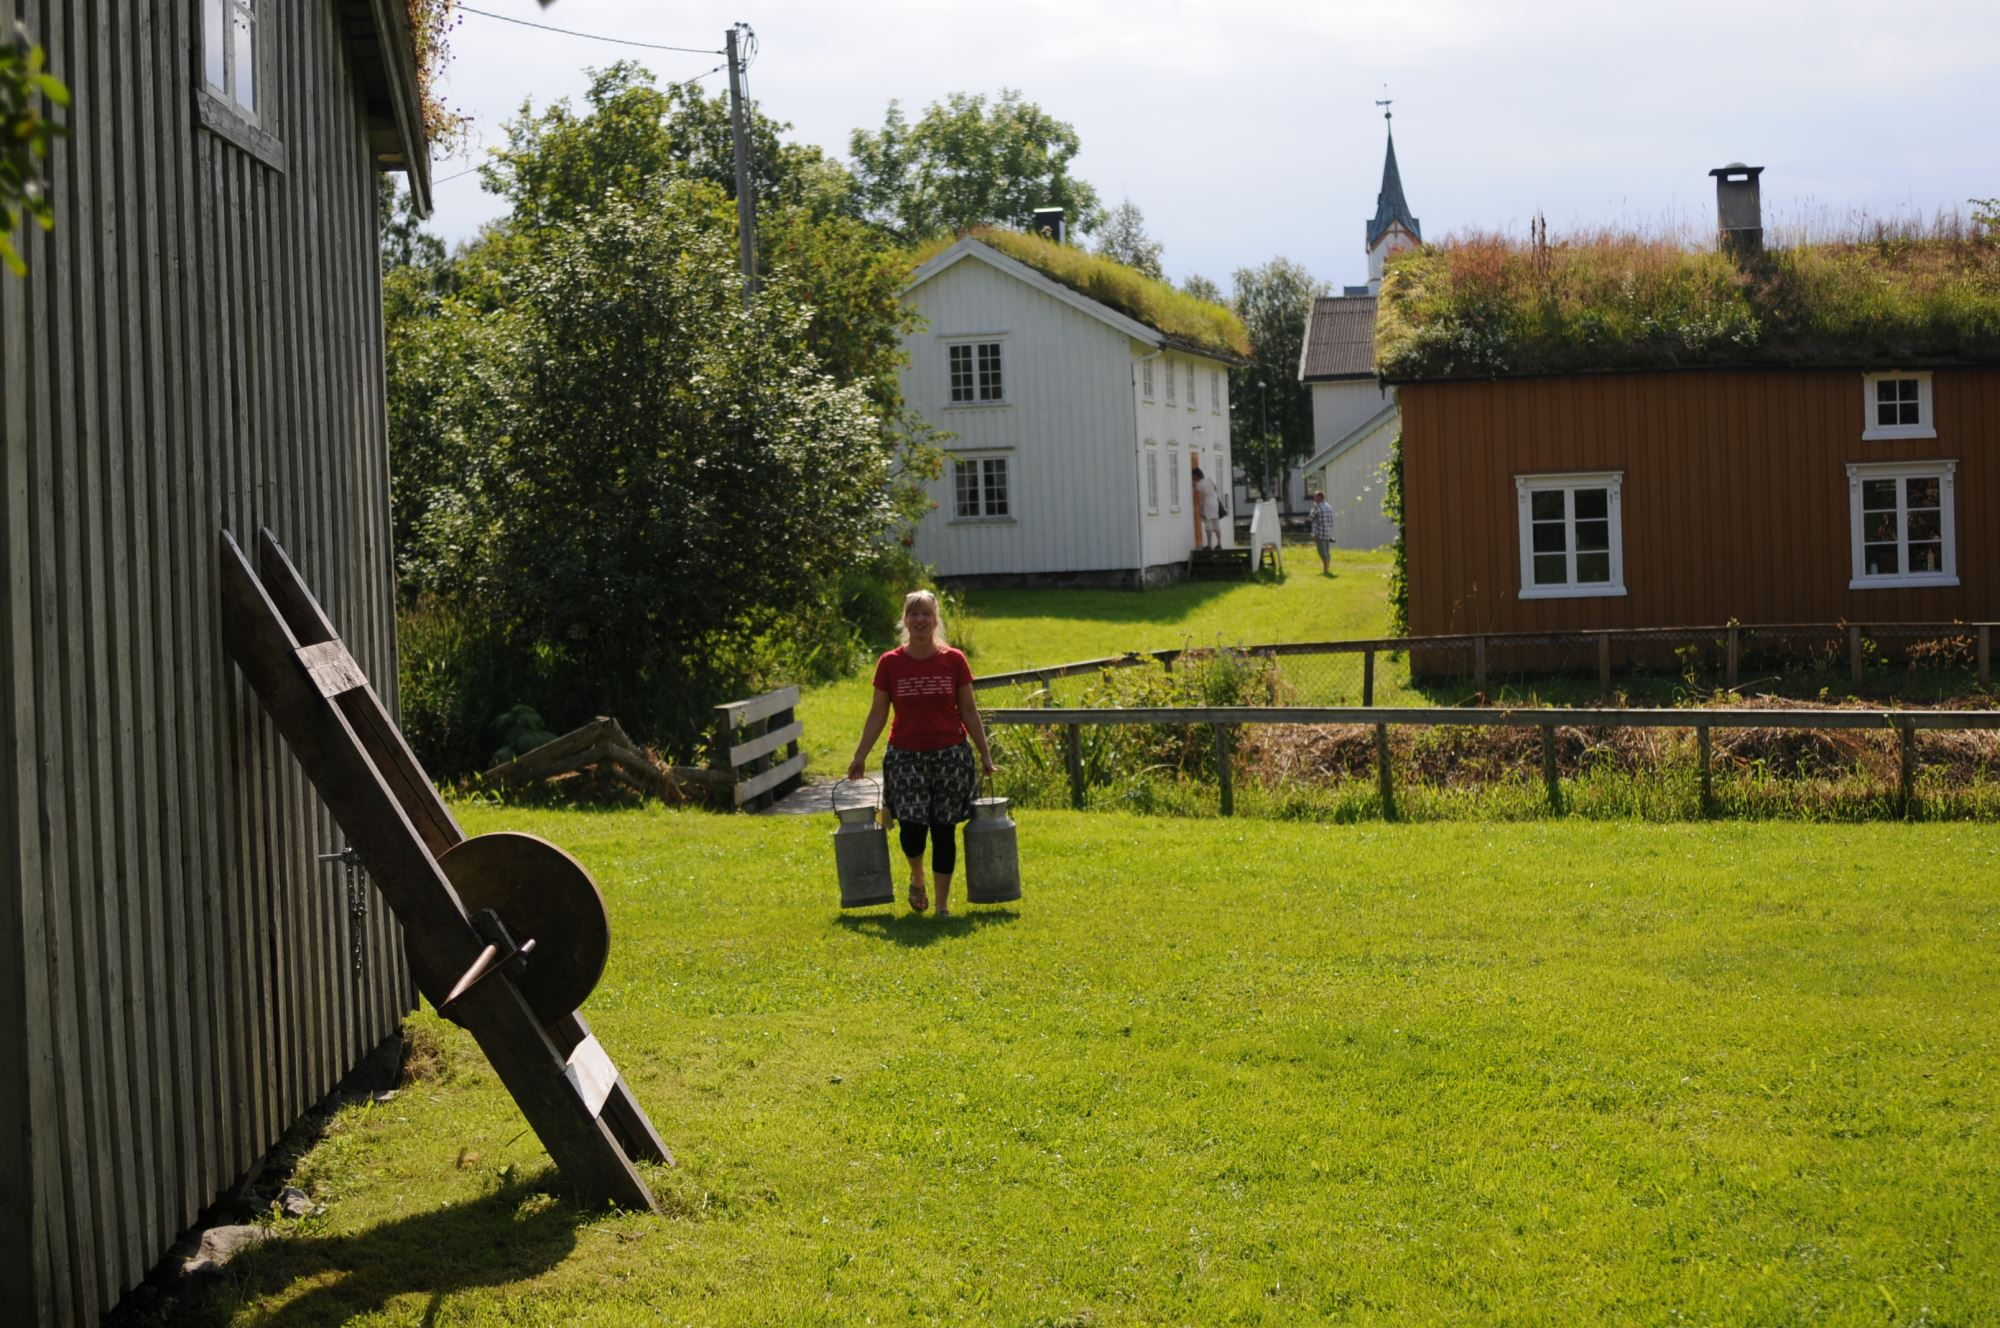 Sømna bygdetun (rural museum)